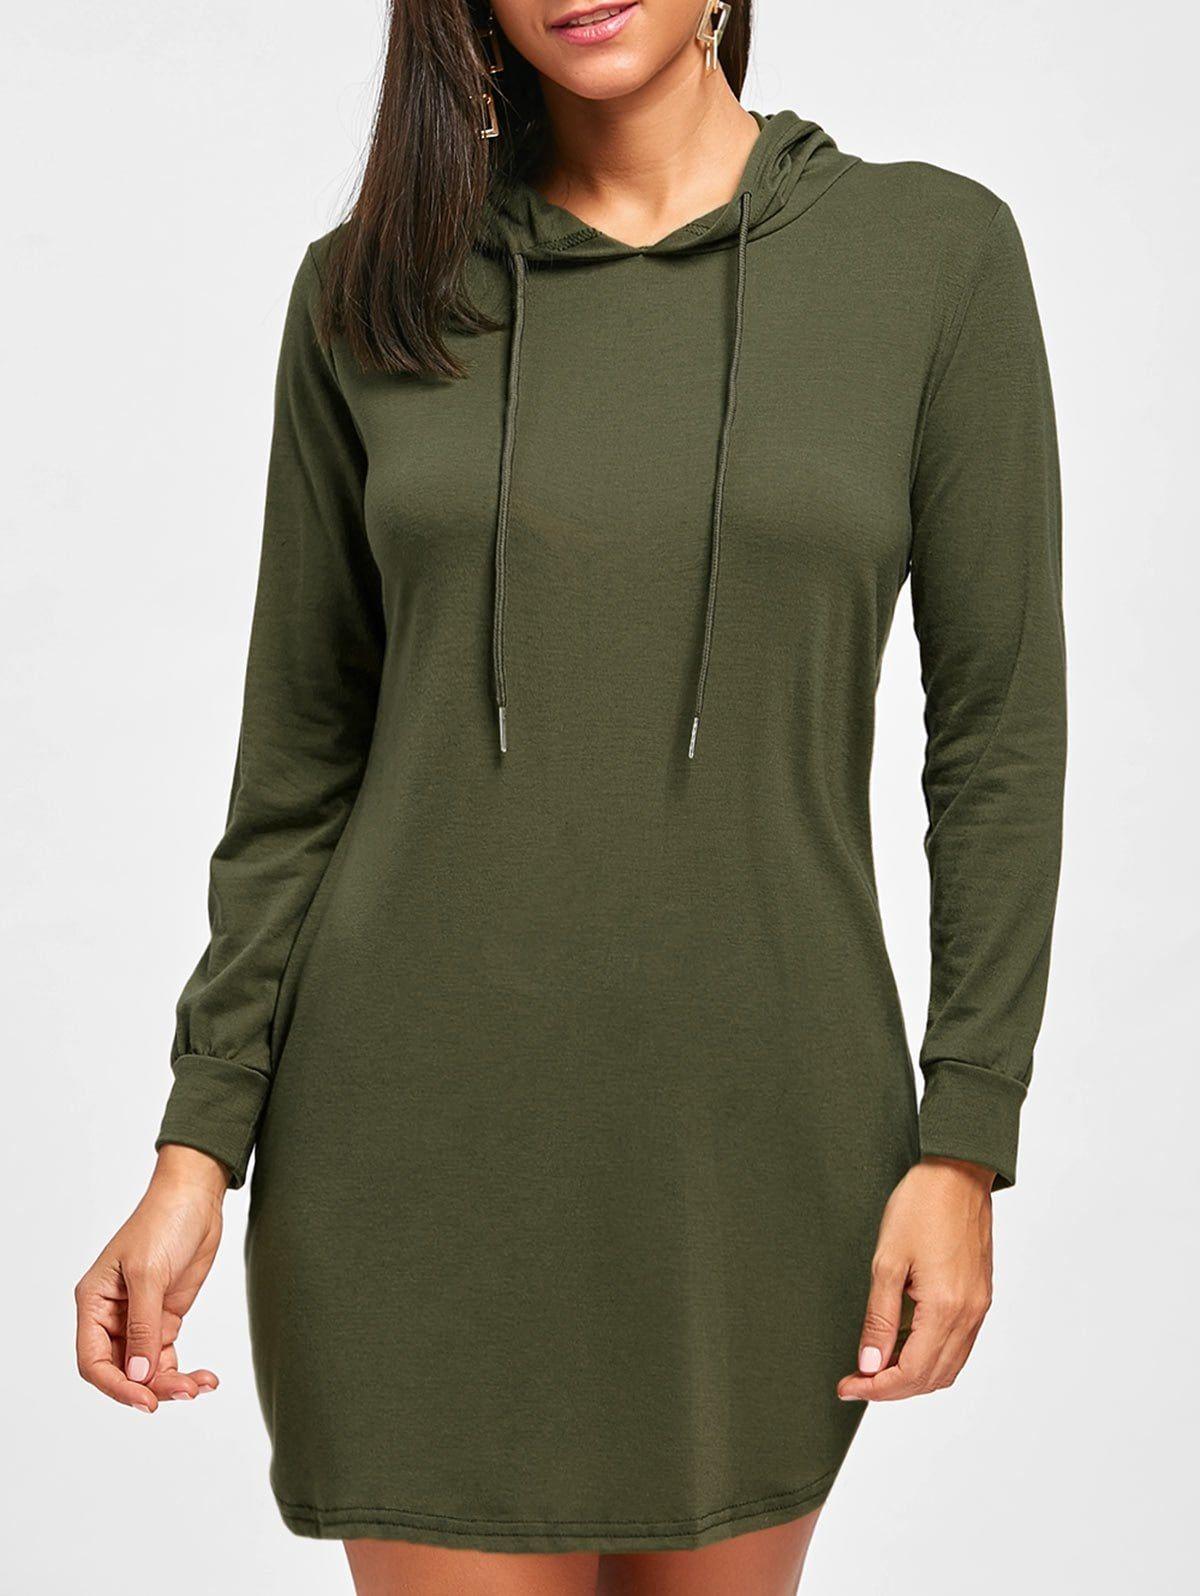 Draswtring long sleeve hooded dress womenus fashion of all kind